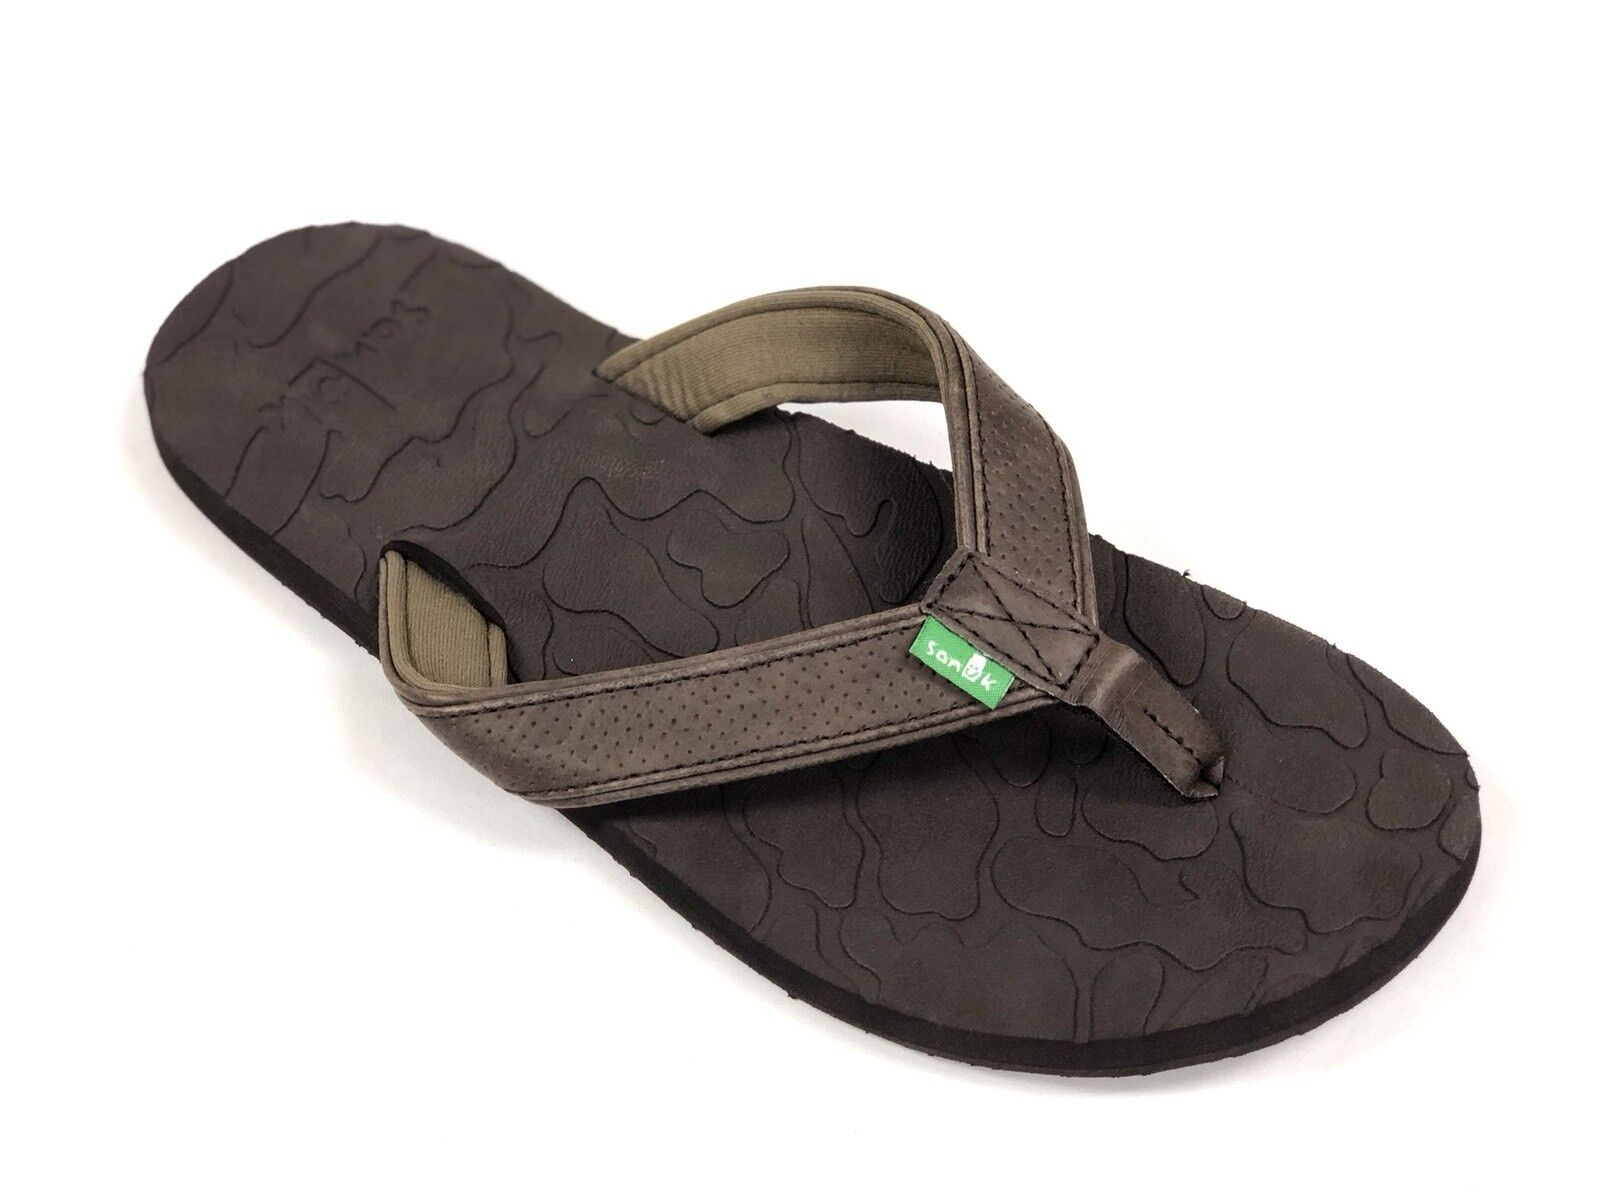 Sanuk Men's HIGH TIDE Brown Leather Strap SMS10644 Casual Flip Flop Sandals NEW